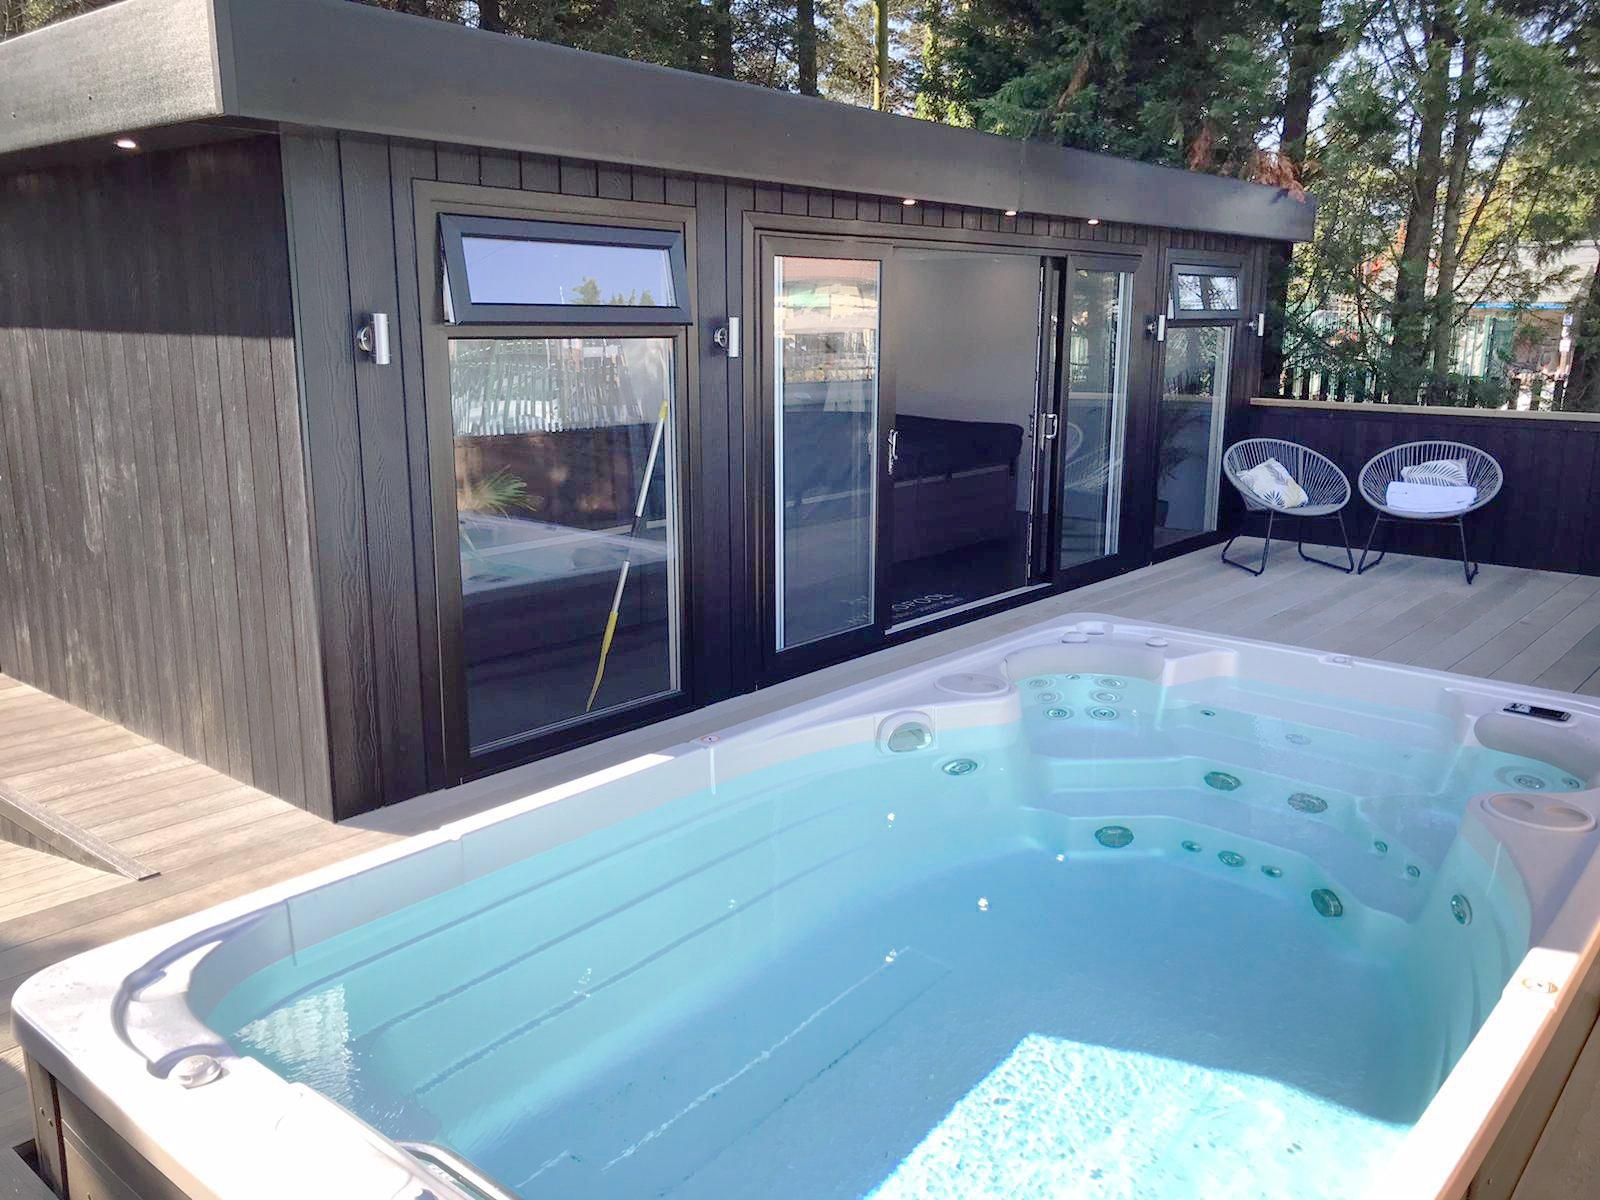 Hydropool Midlands - 14ft Aqua Sport - Showroom